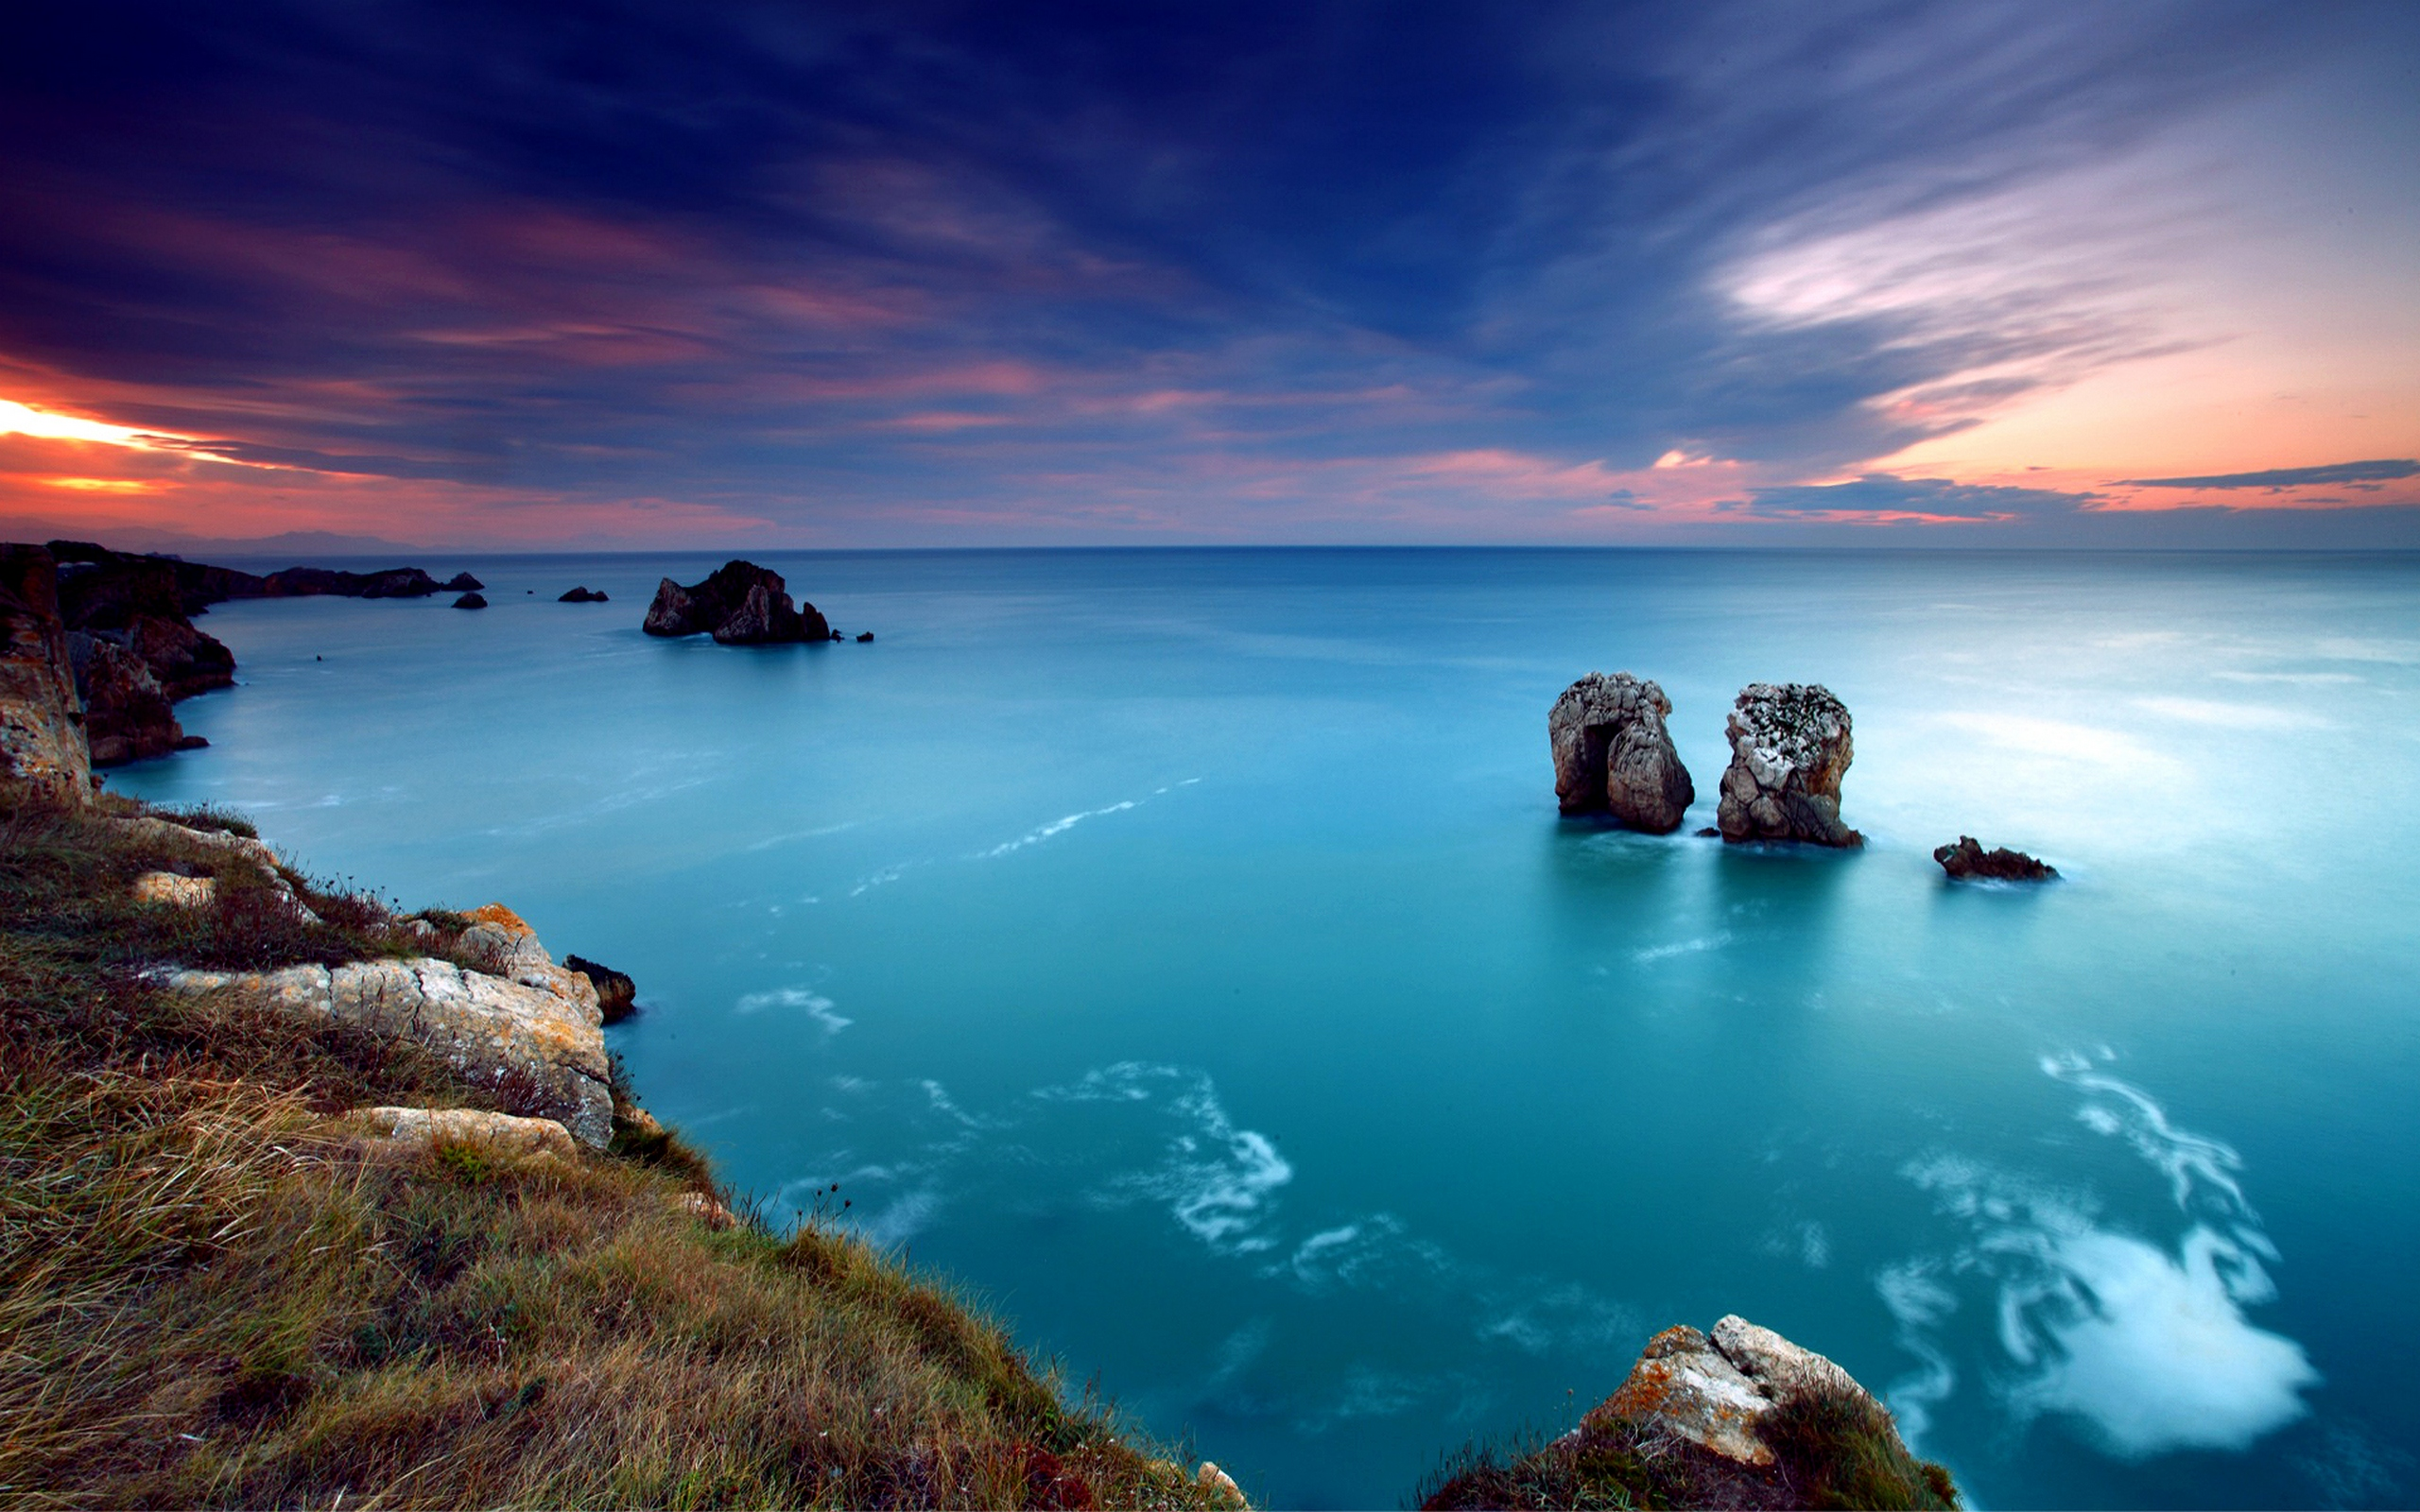 hd wallpapers sunset beautiful landscape nature ocean sky 2560x1600